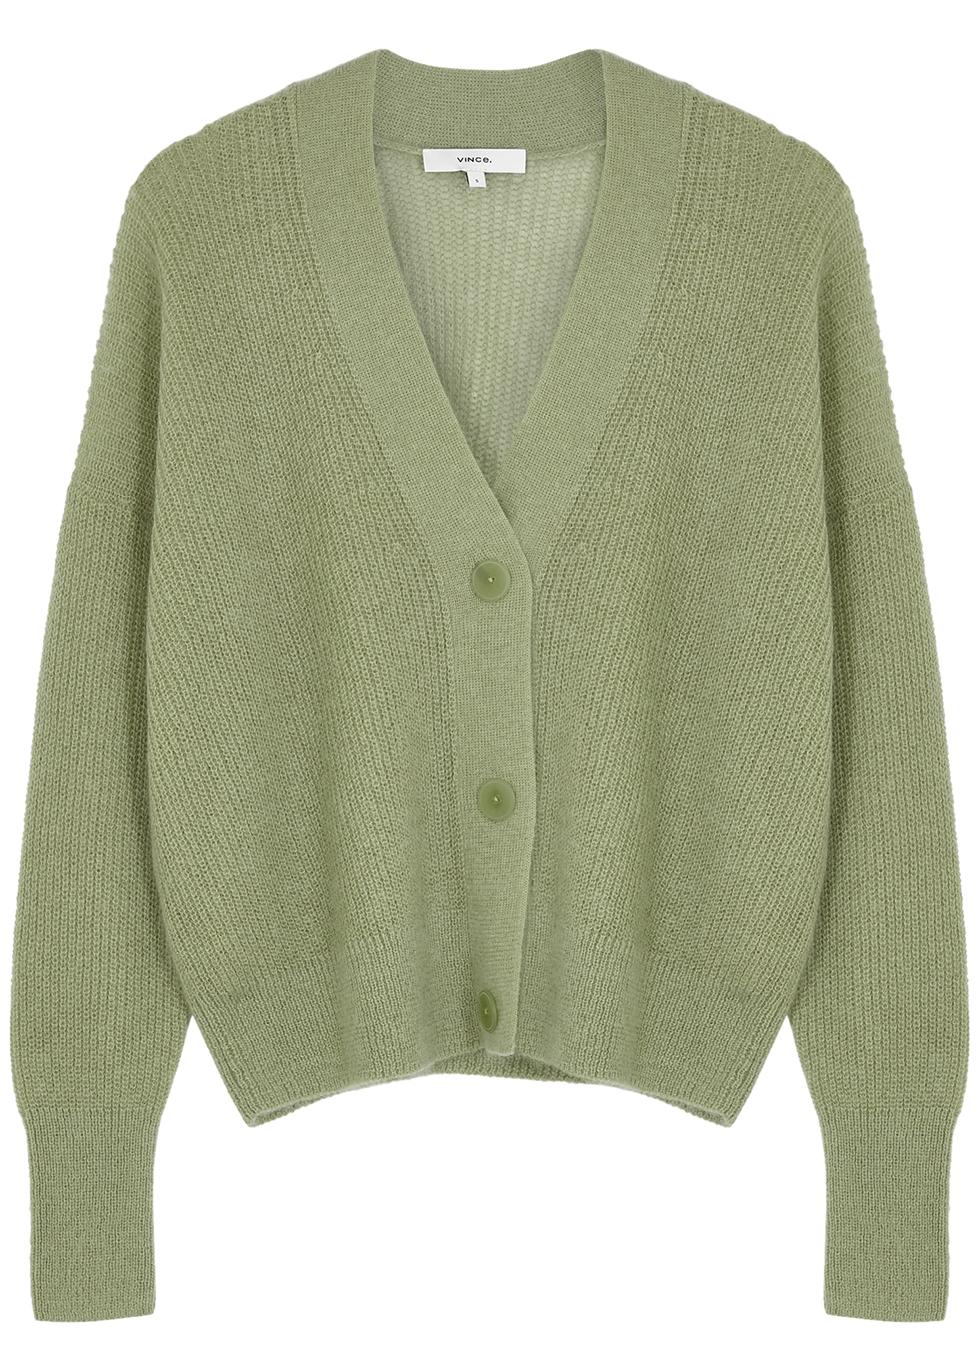 Light green ribbed knit cardigan